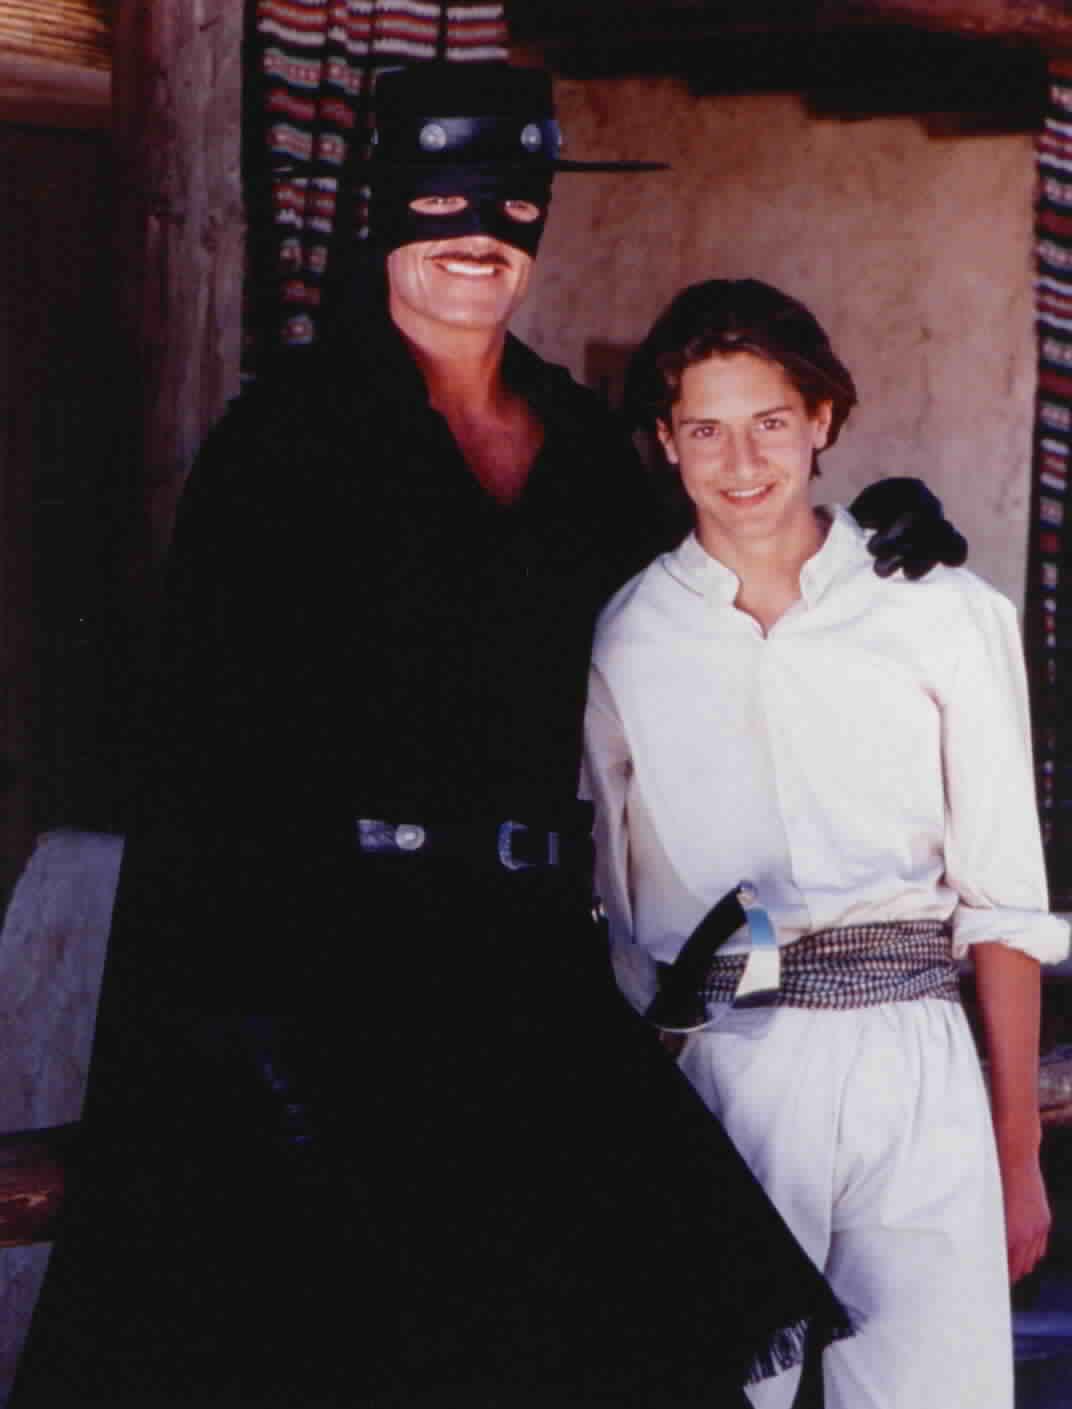 Zorro and Felipe